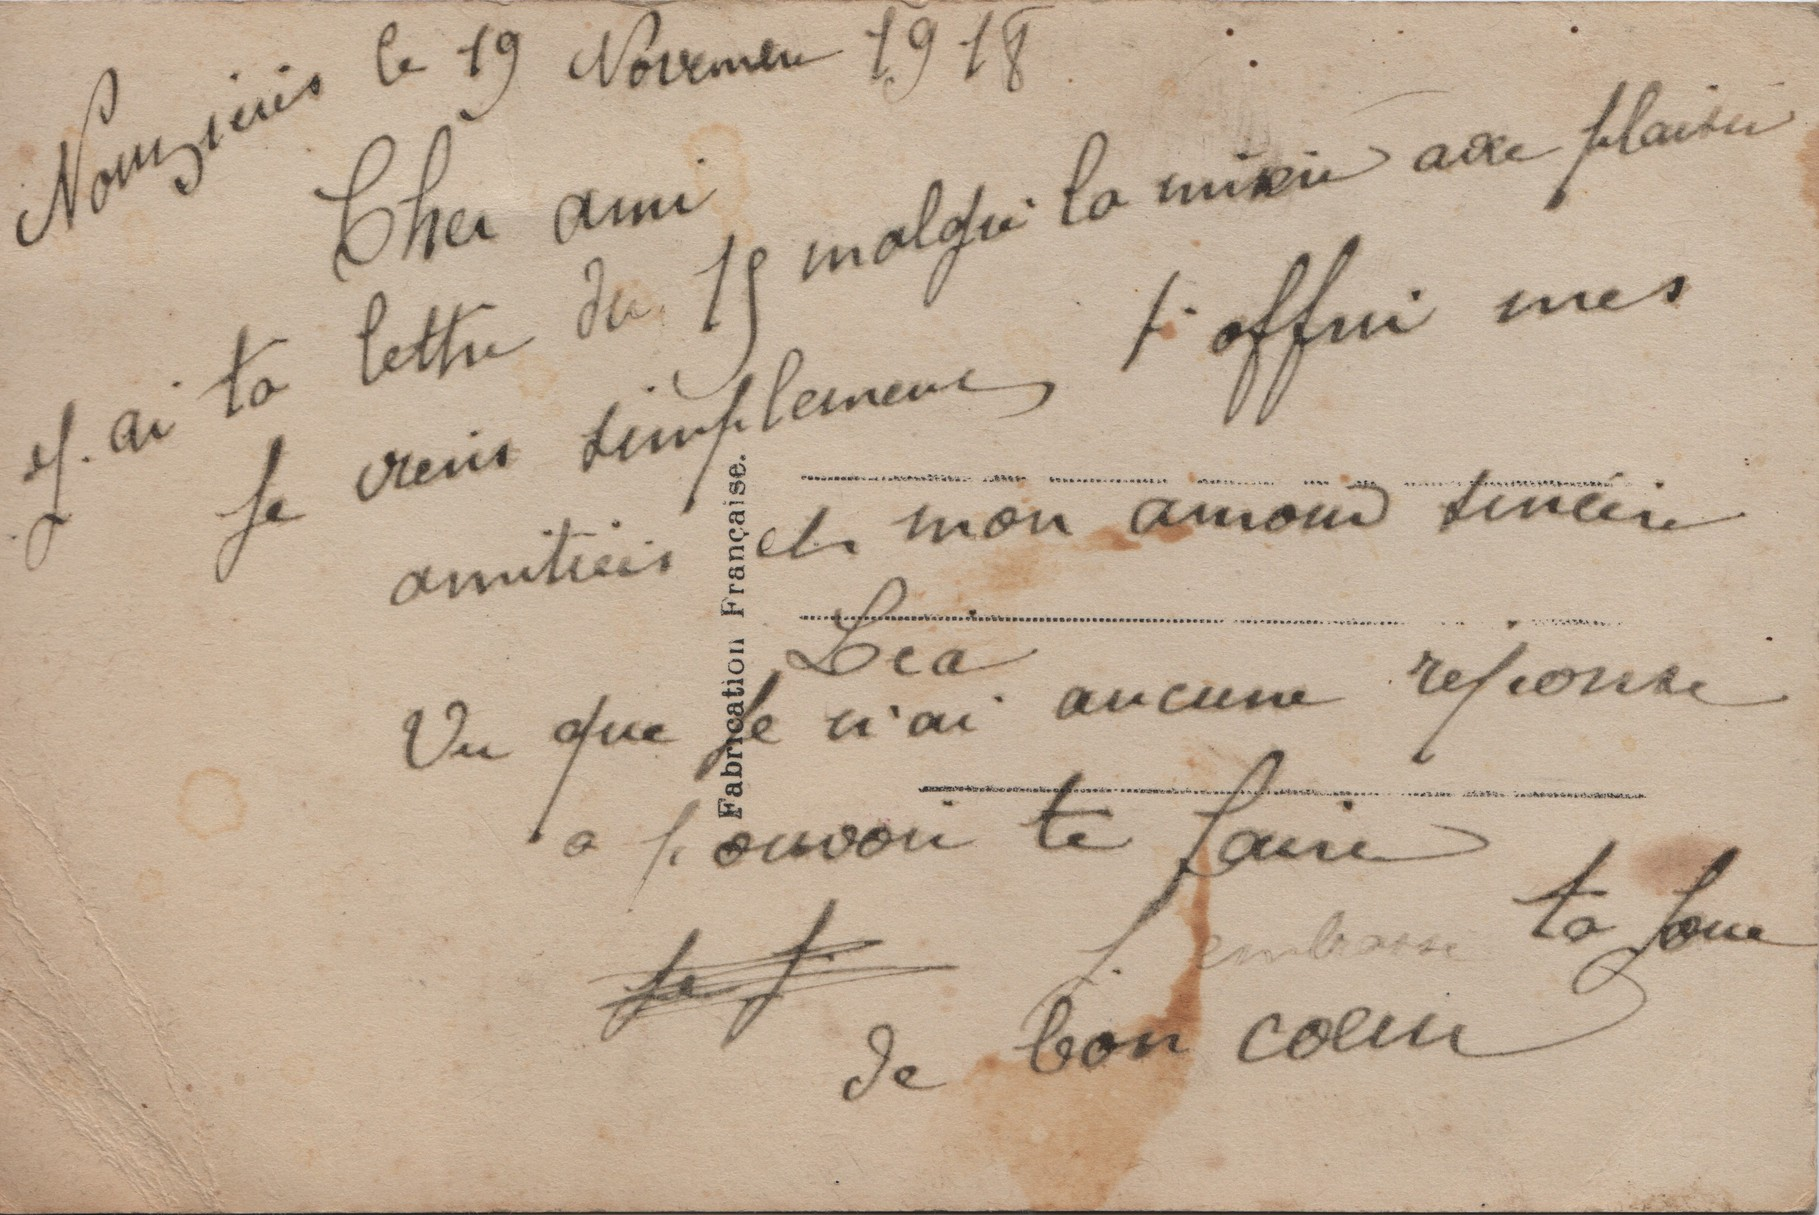 5. Nouzières 19 November 1918